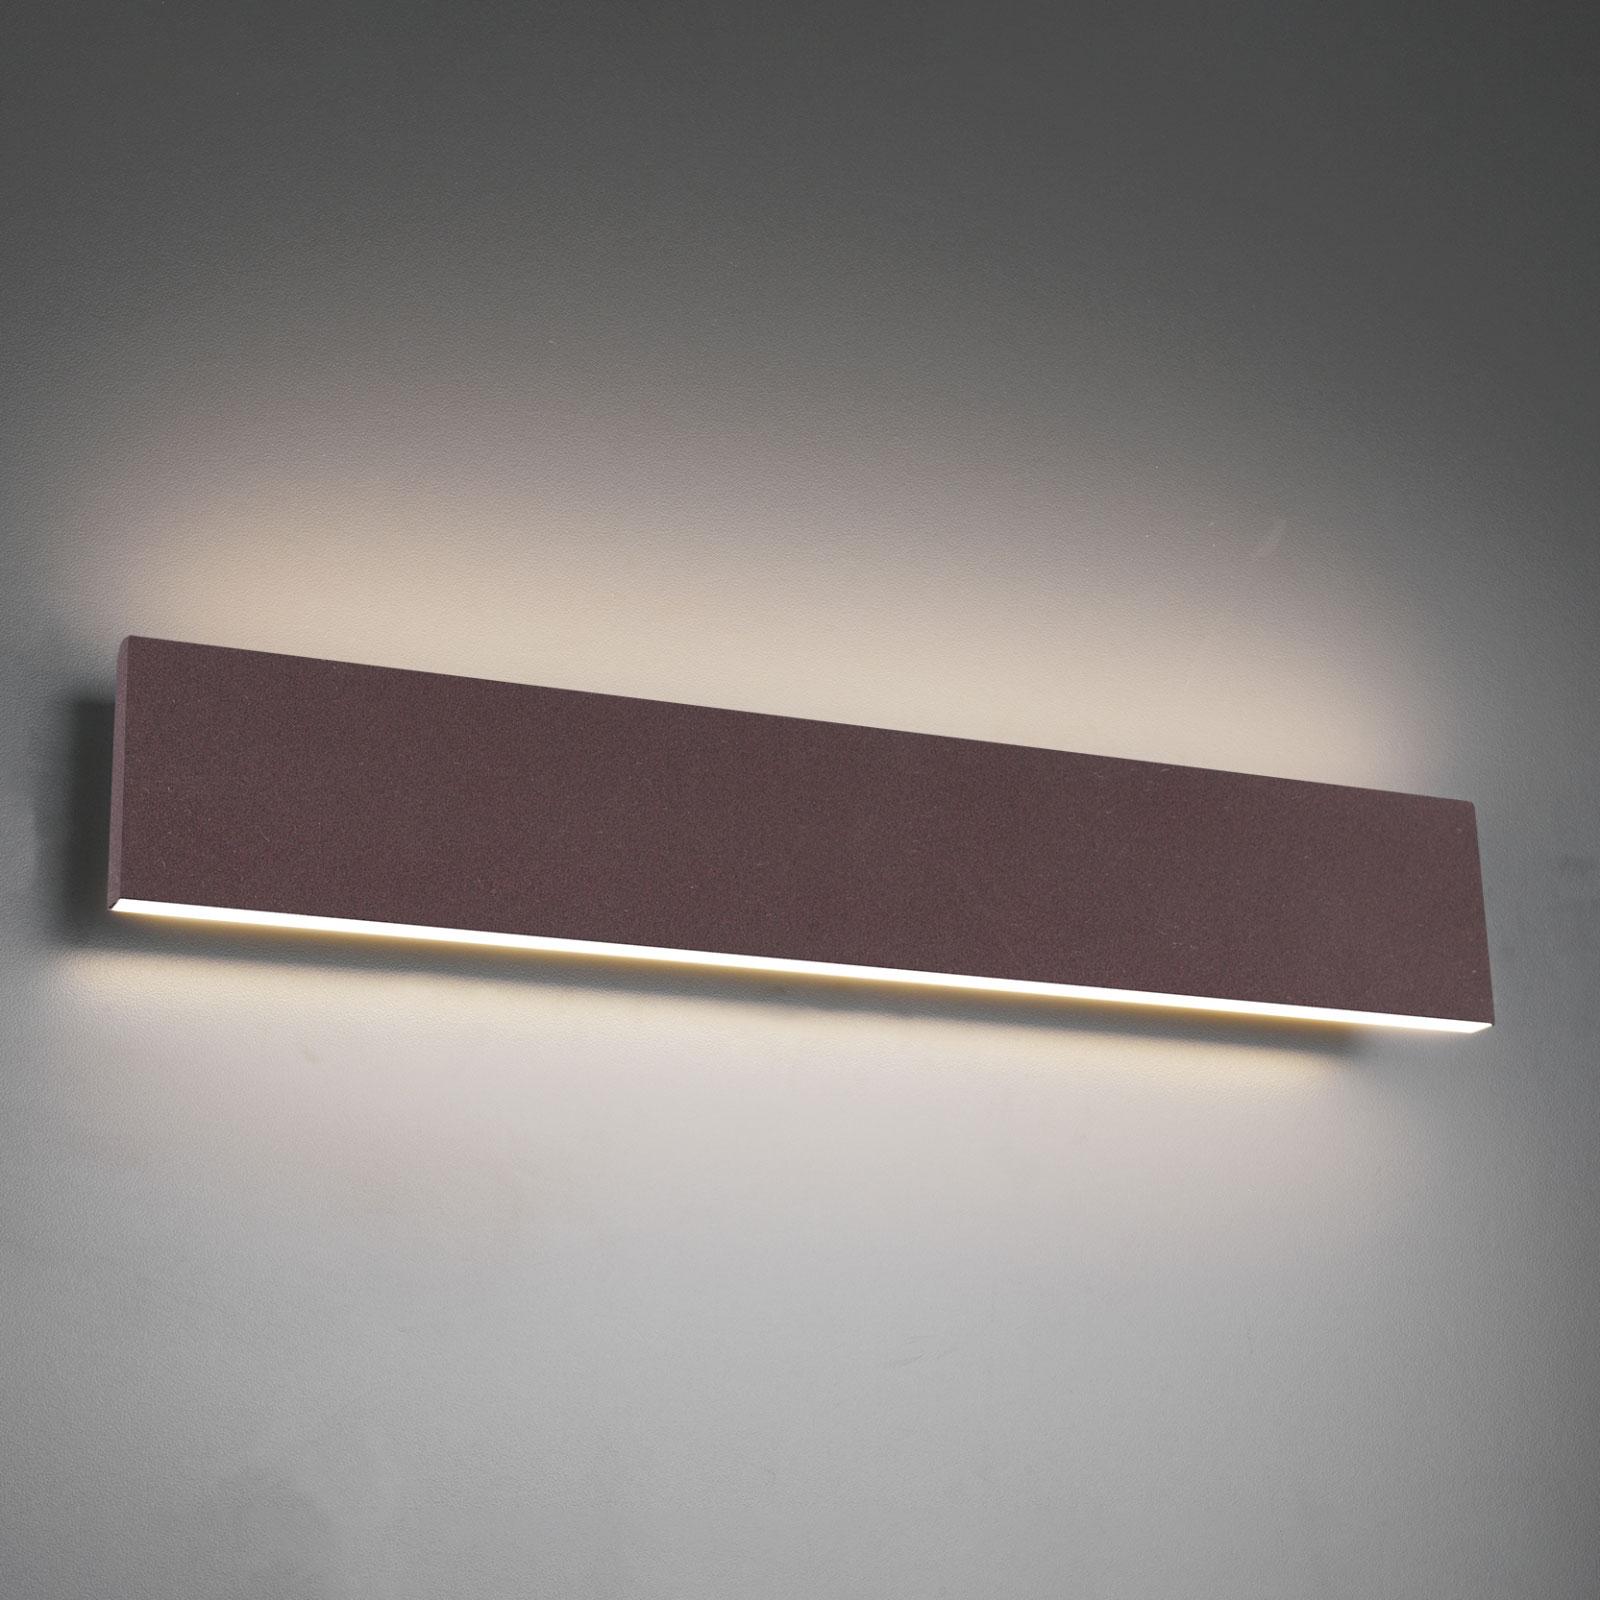 LED wandlamp Concha 47 cm, roest